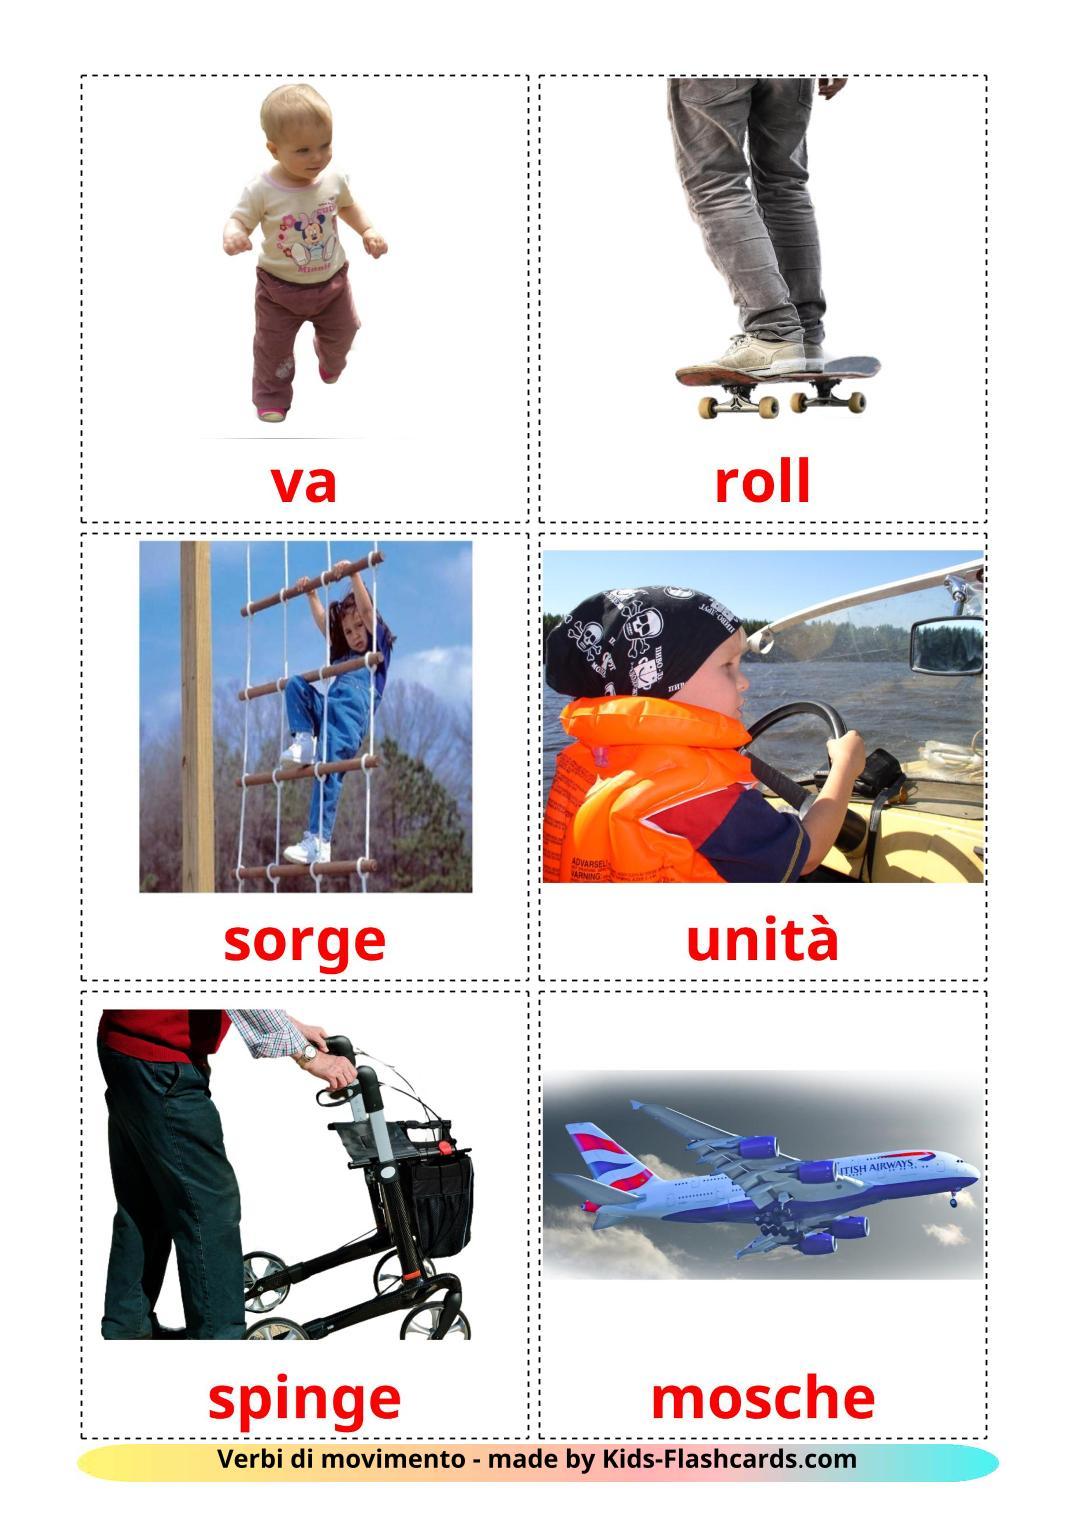 Movement verbs - 22 Free Printable italian Flashcards